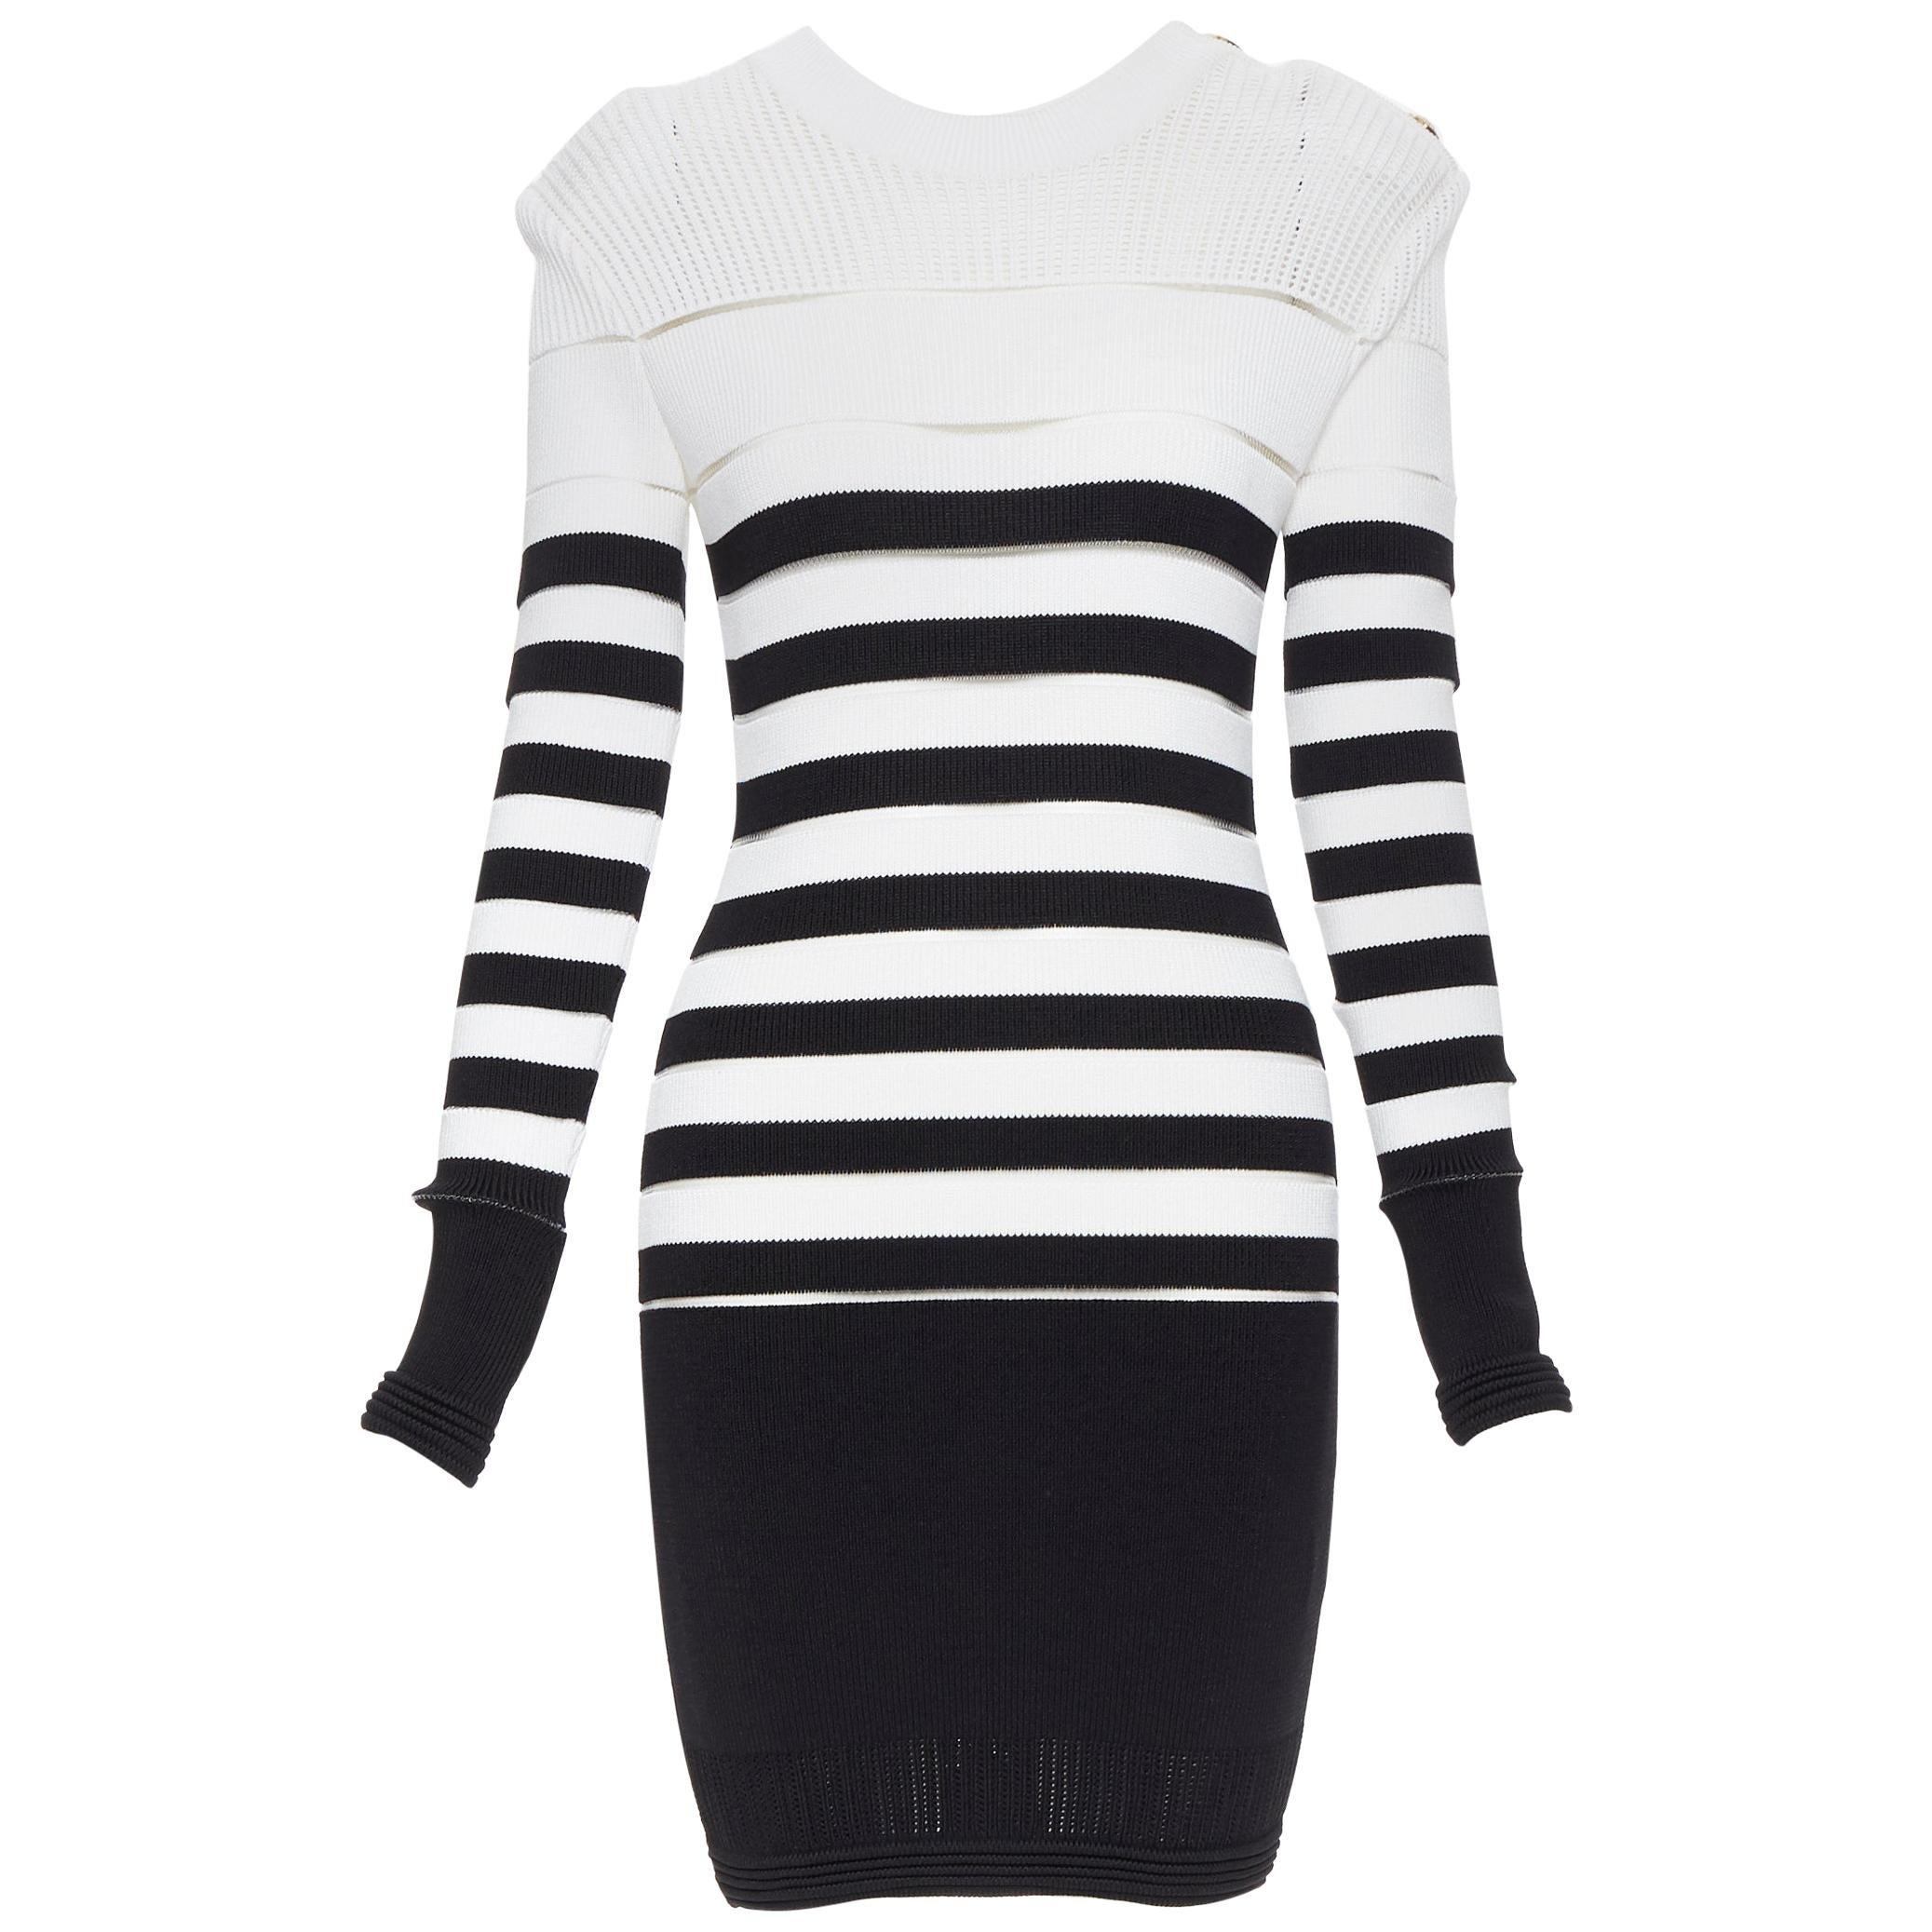 new BALMAIN black white sheer mesh stripe military crochet knit bodycon dress S